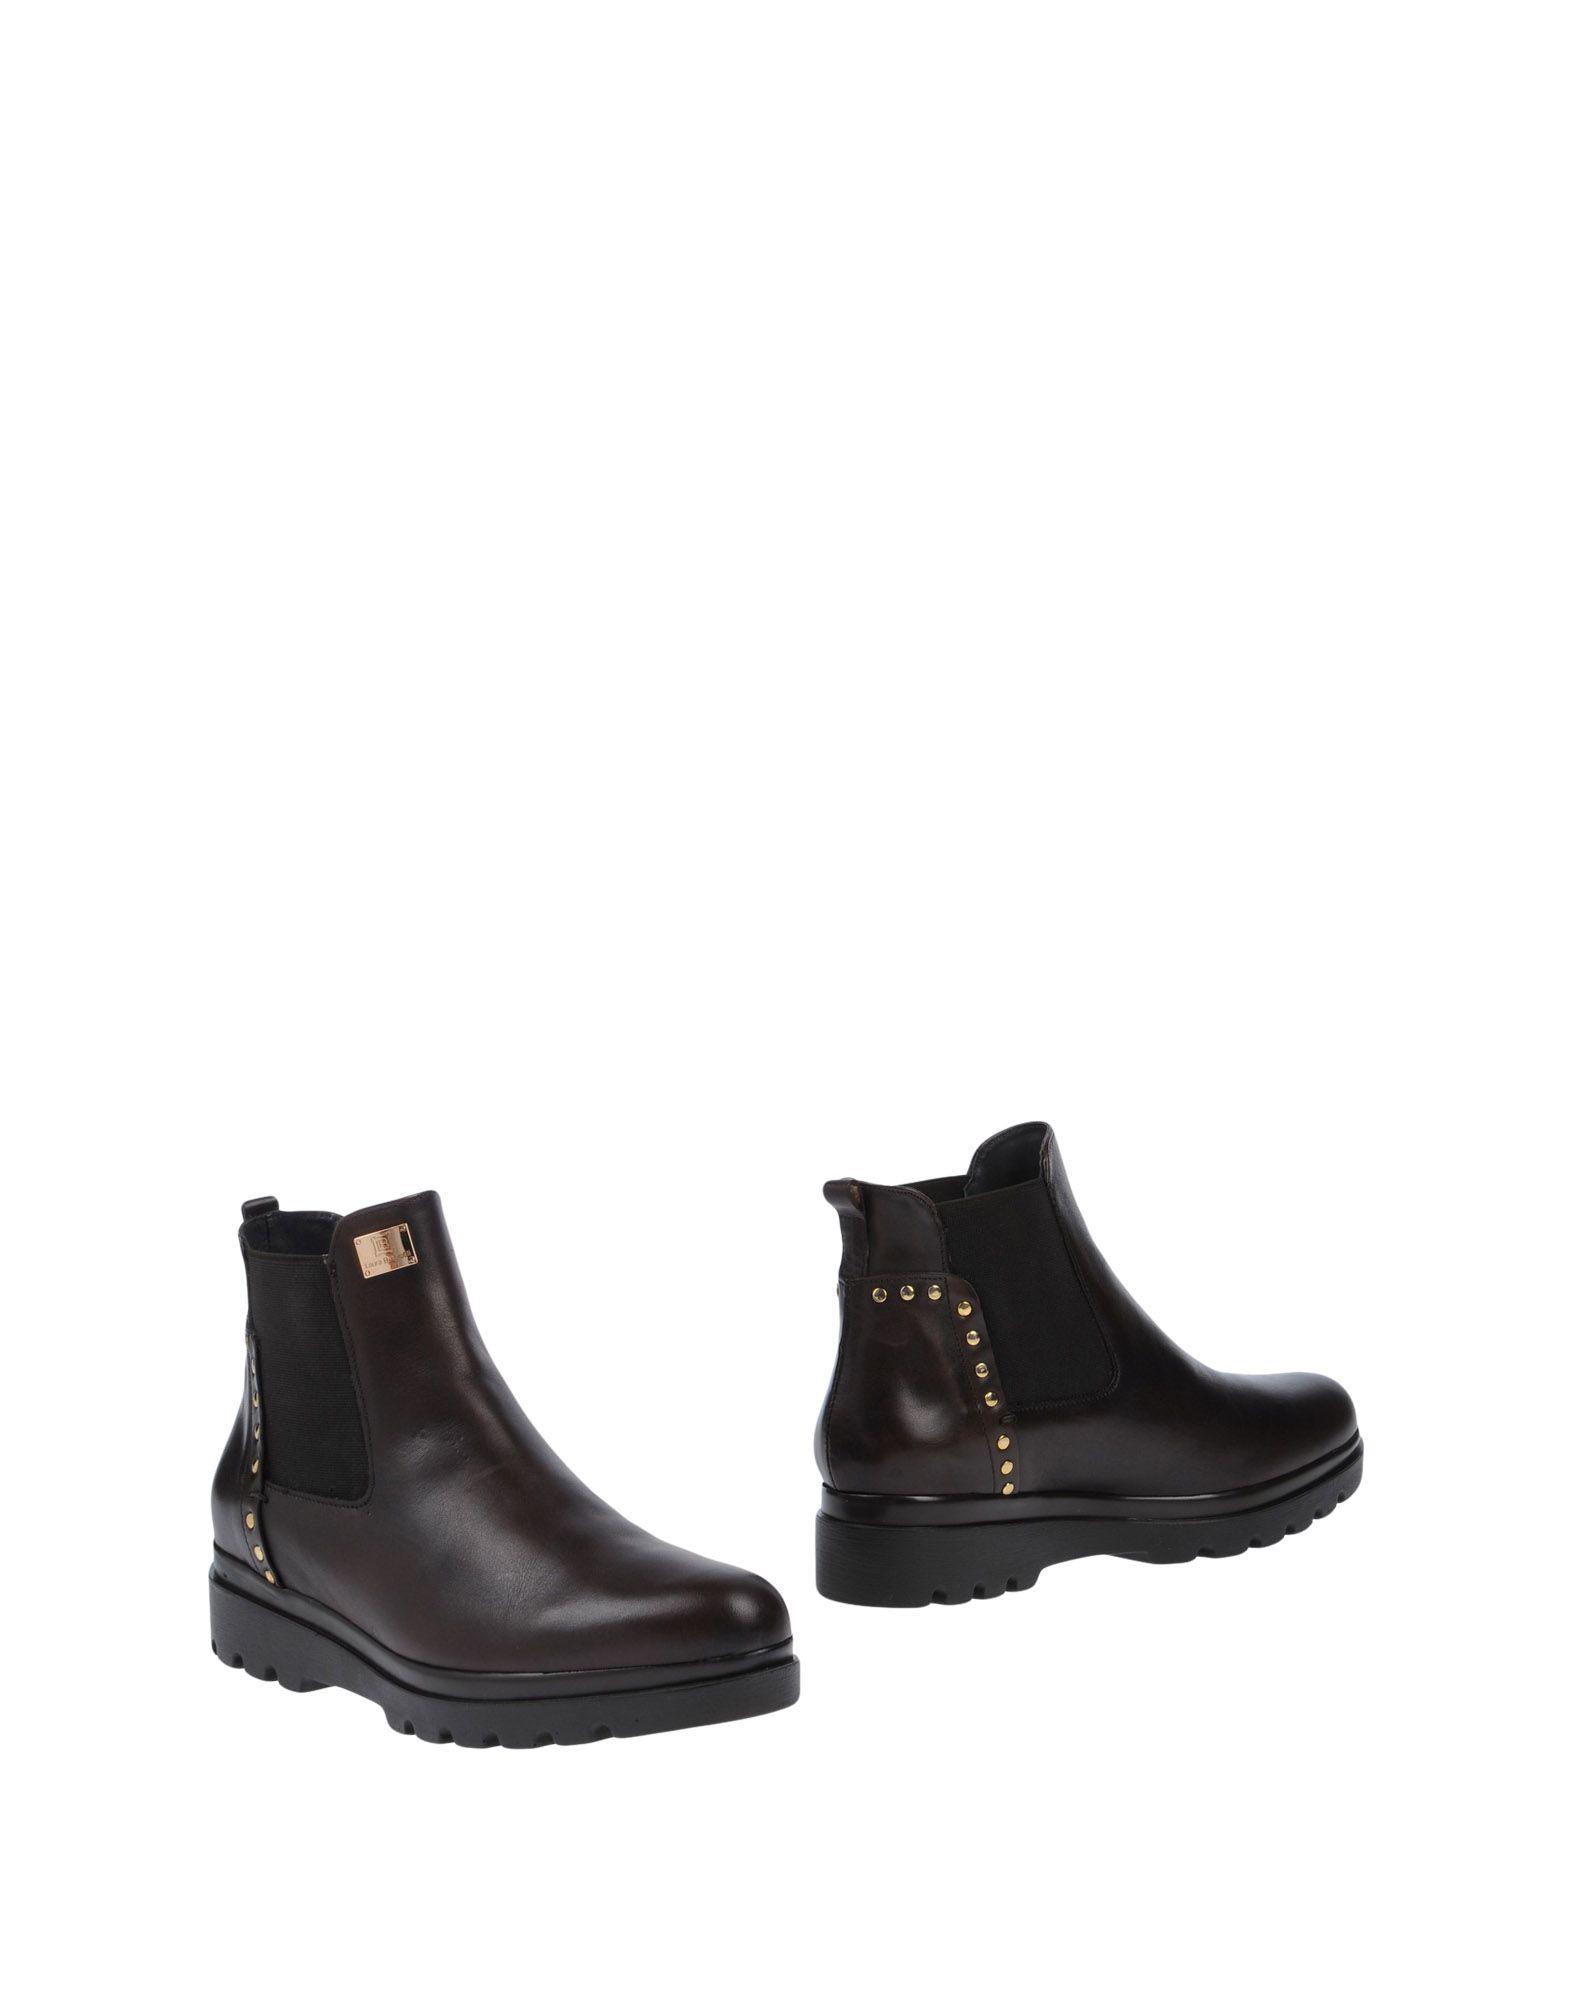 Laura Biagiotti Chelsea Boots Boots Boots Damen  11505719HQ Gute Qualität beliebte Schuhe c76e66